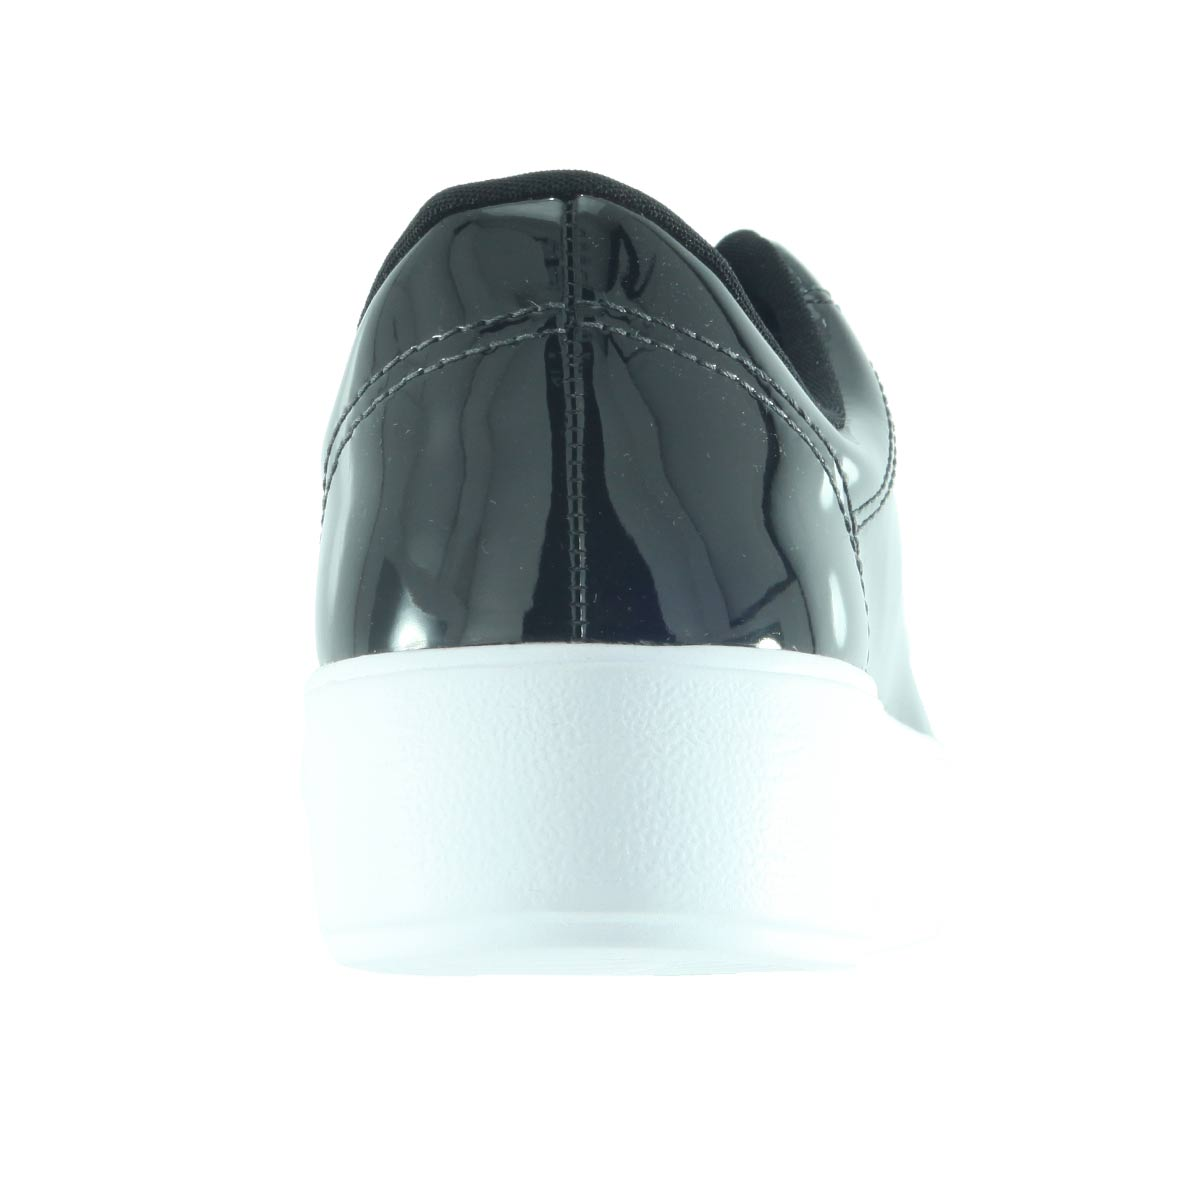 Tênis Mississipi Flatform Biqueira Hot Fix X6401